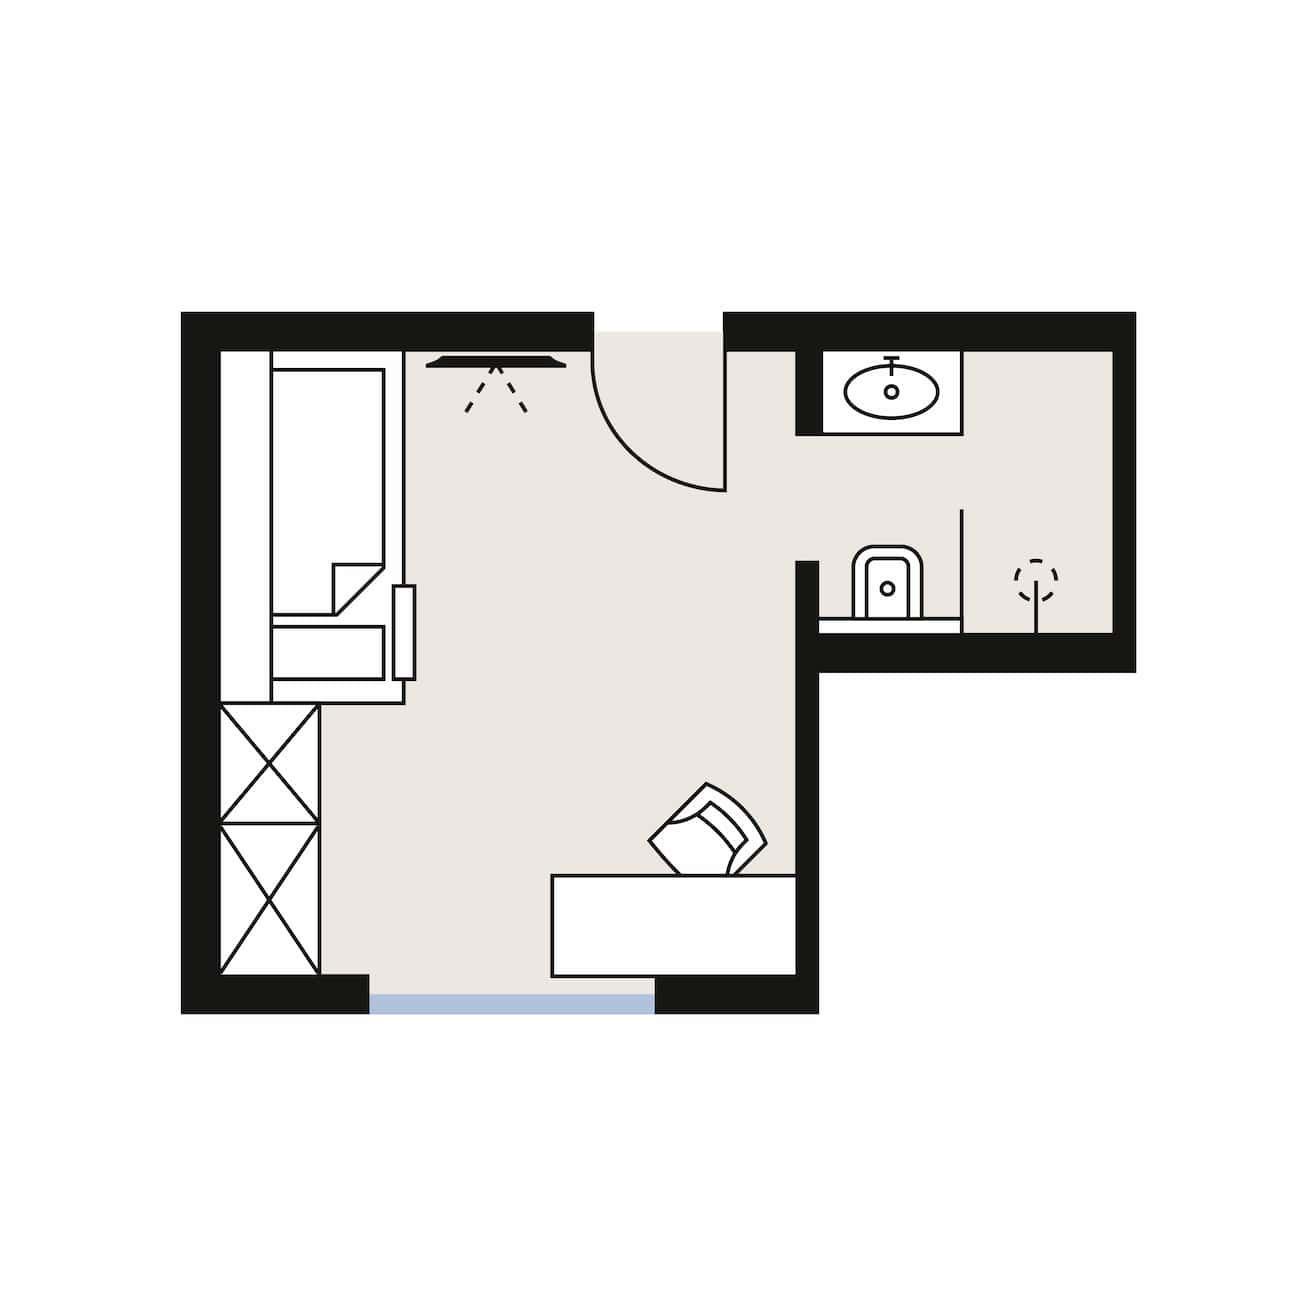 Komfort Malfon Room Sketch